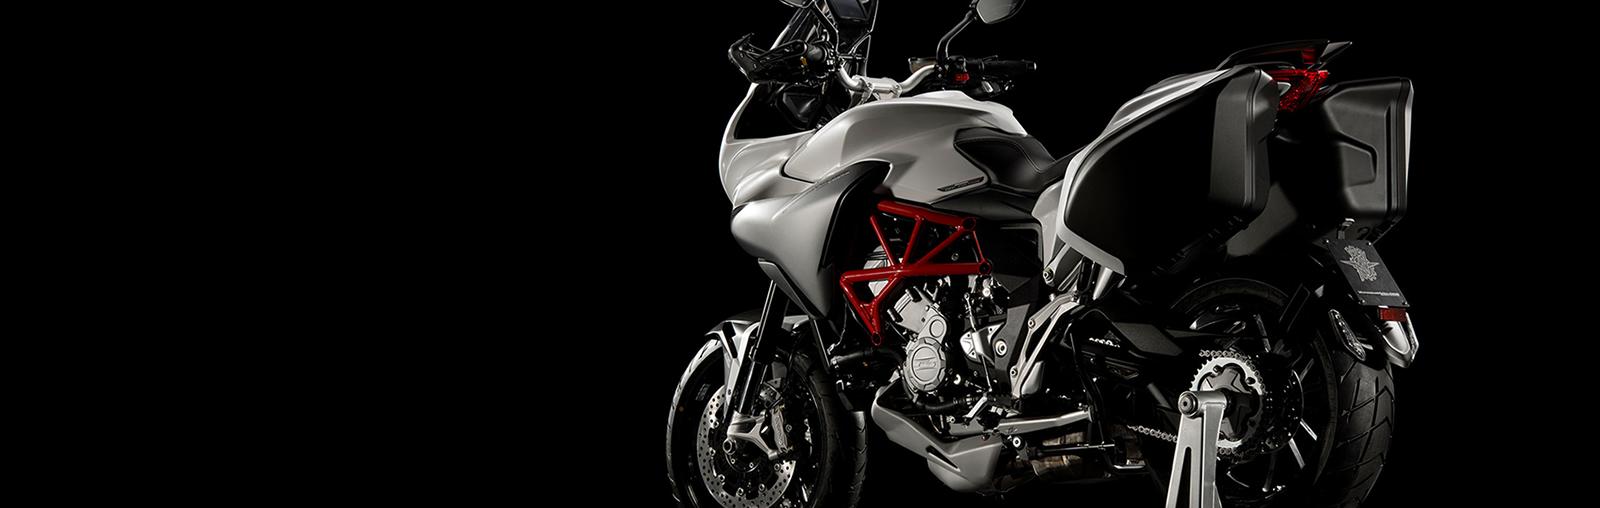 Ducati Dealer San Diego